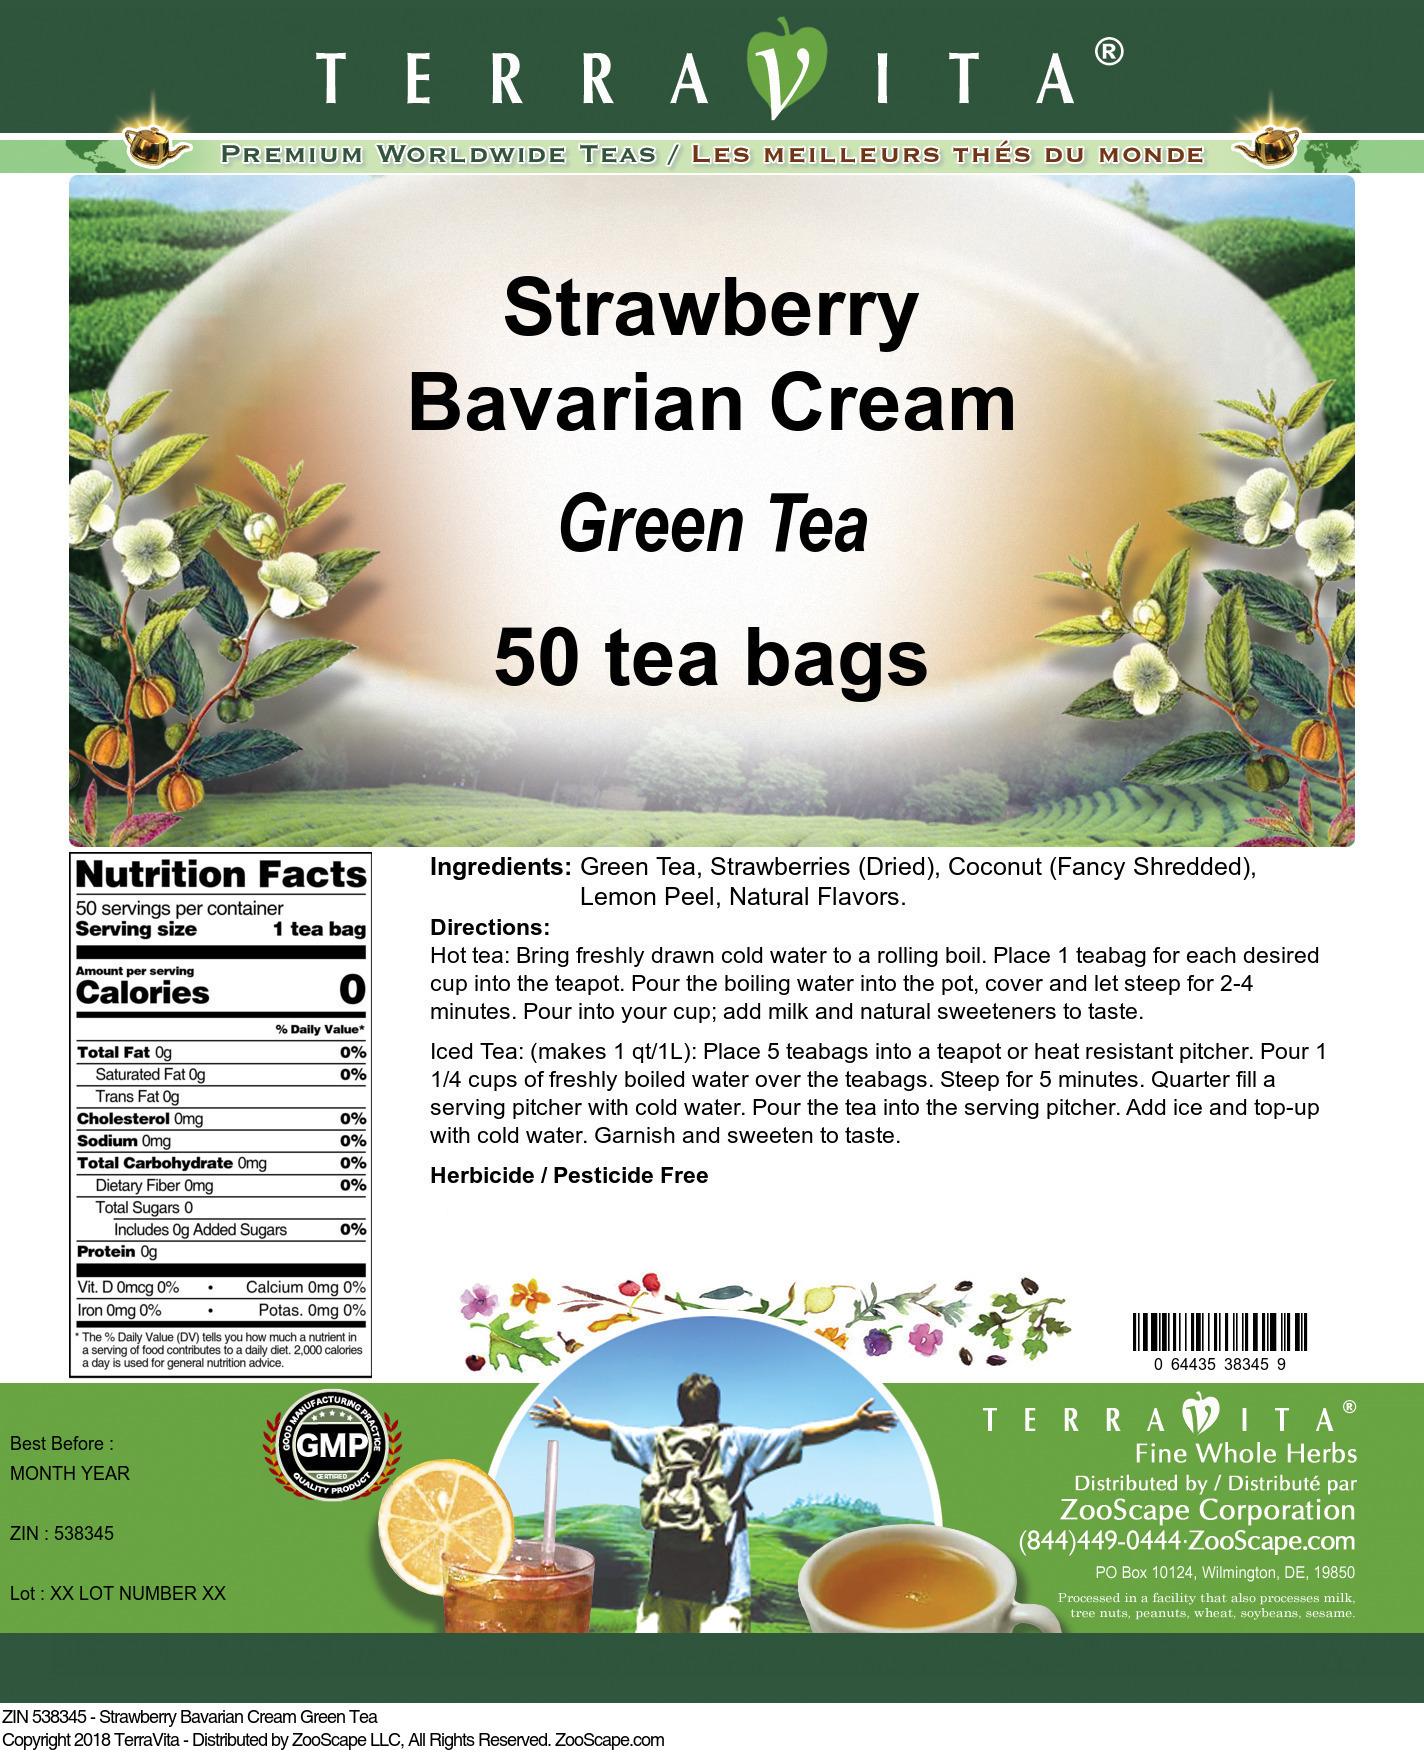 Strawberry Bavarian Cream Green Tea